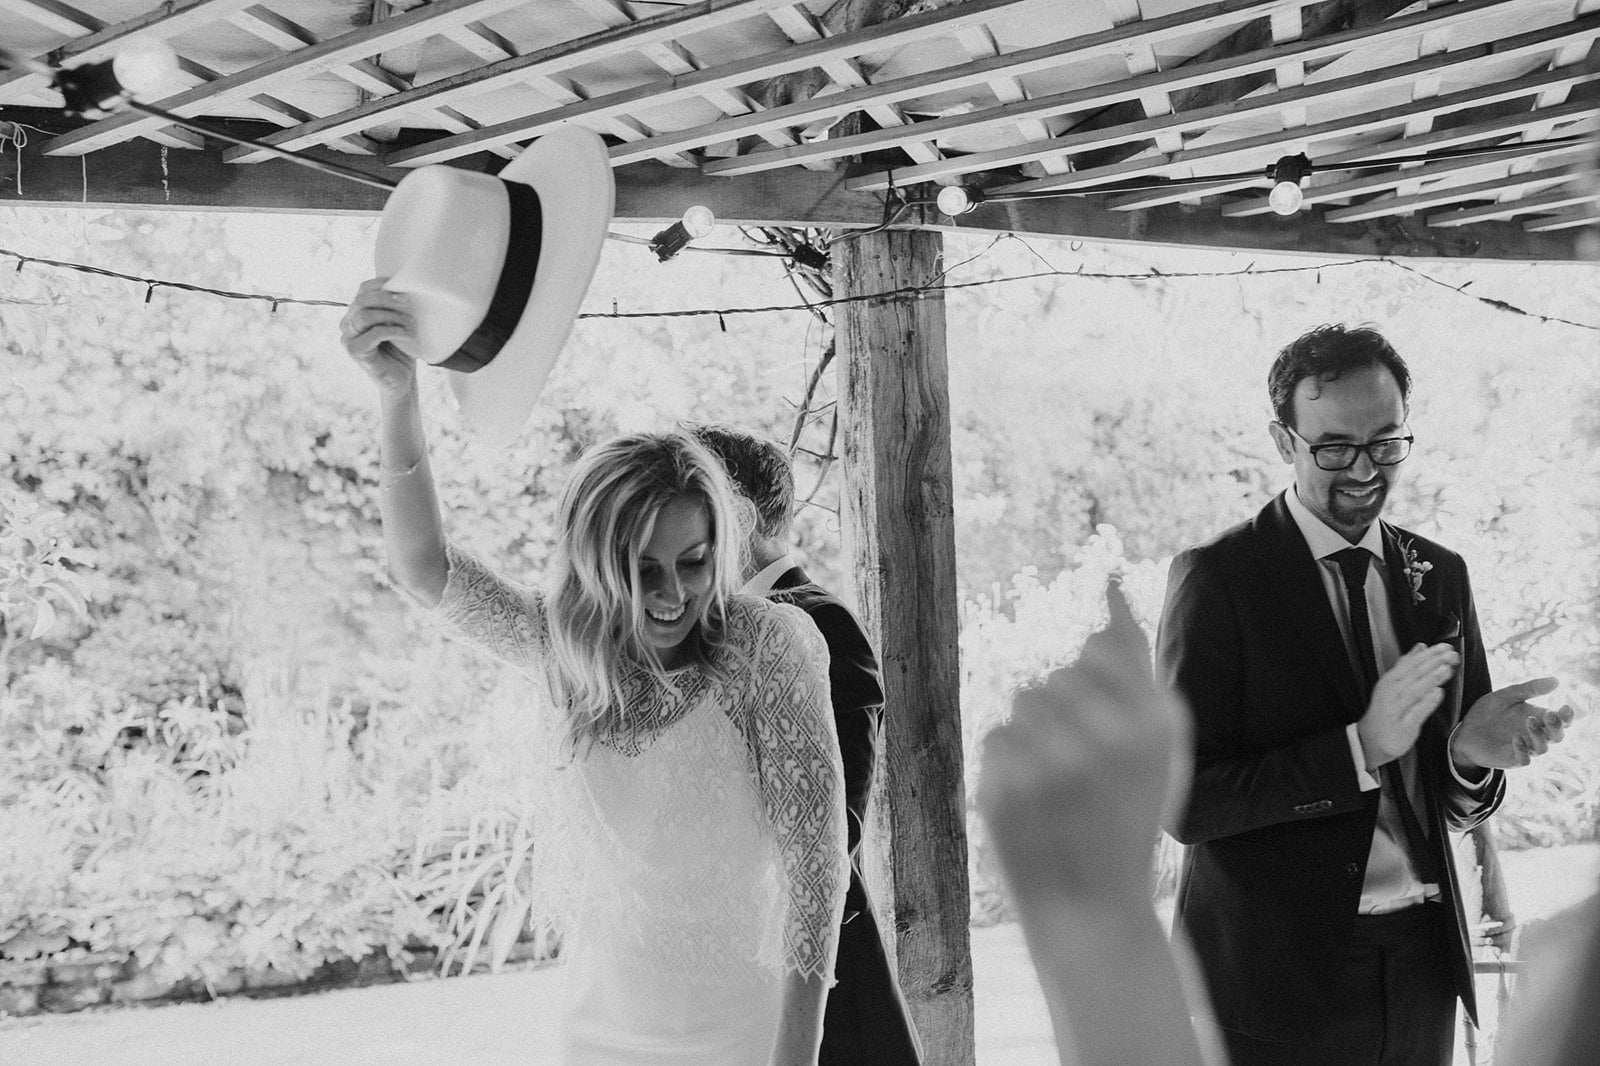 artistic wedding photography somerset